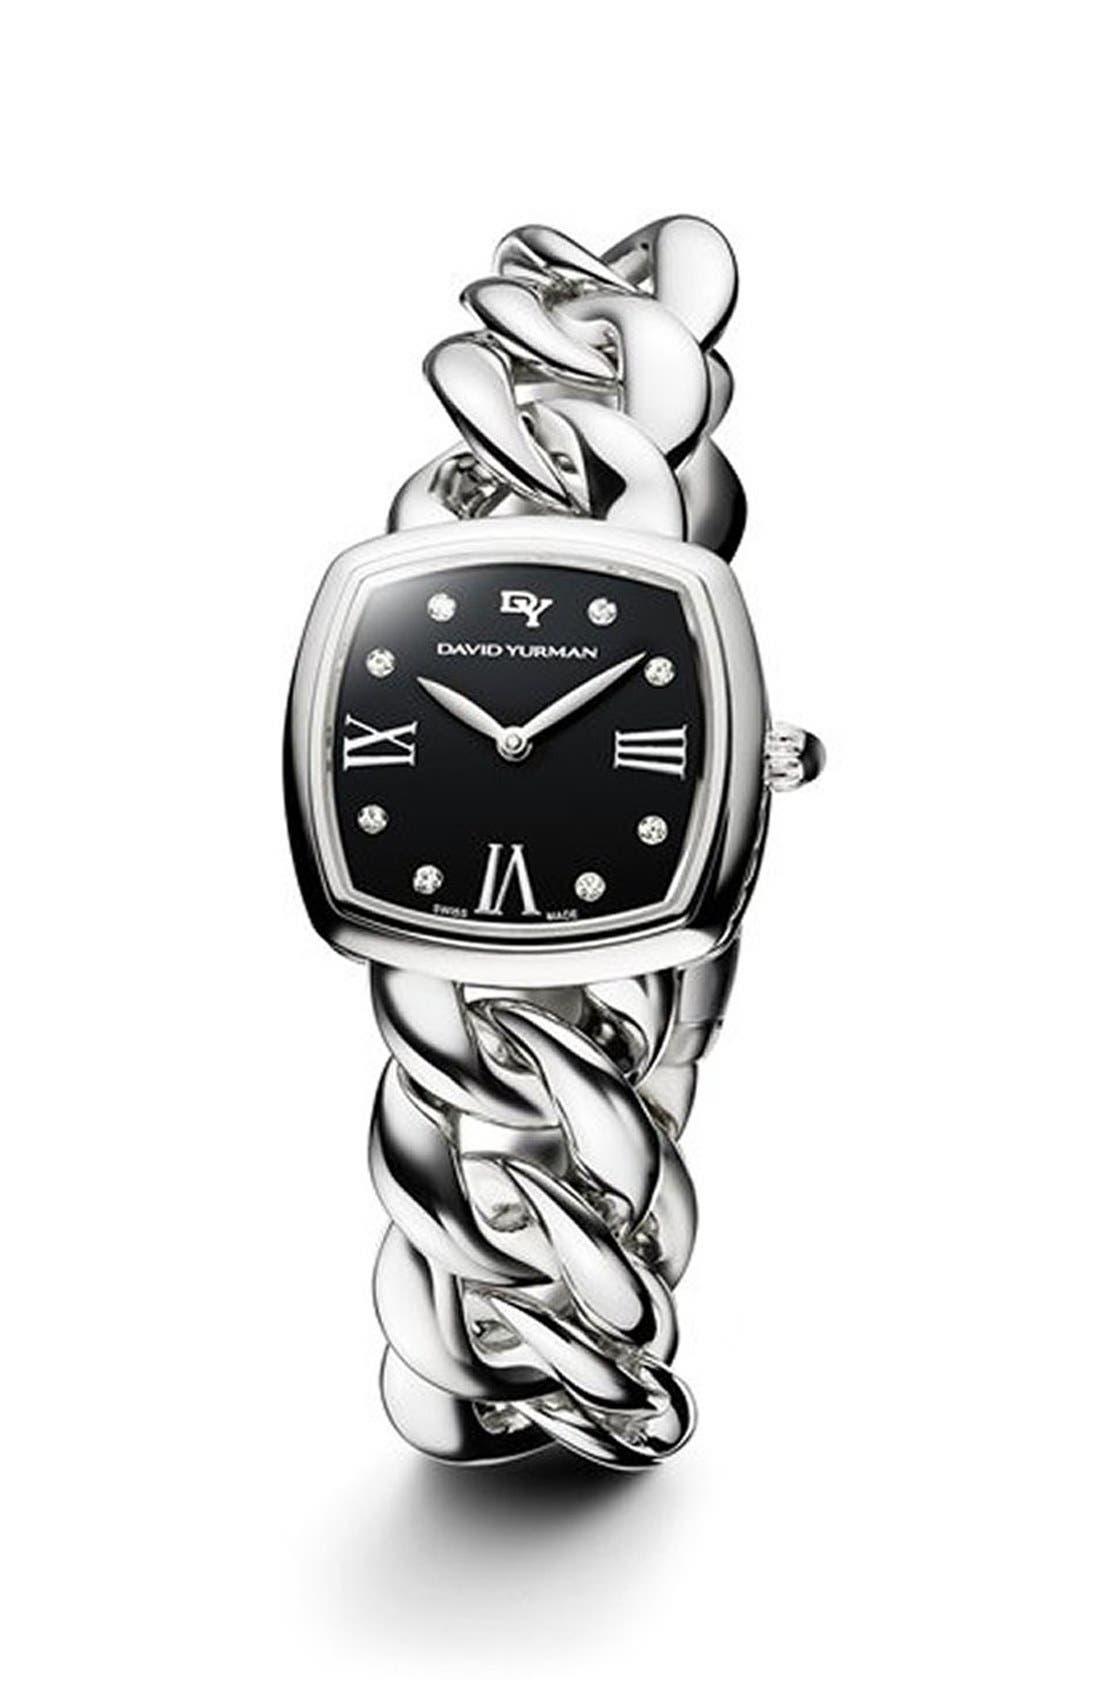 David Yurman 'Albion' 27mm Stainless Steel Quartz Watch with Diamonds